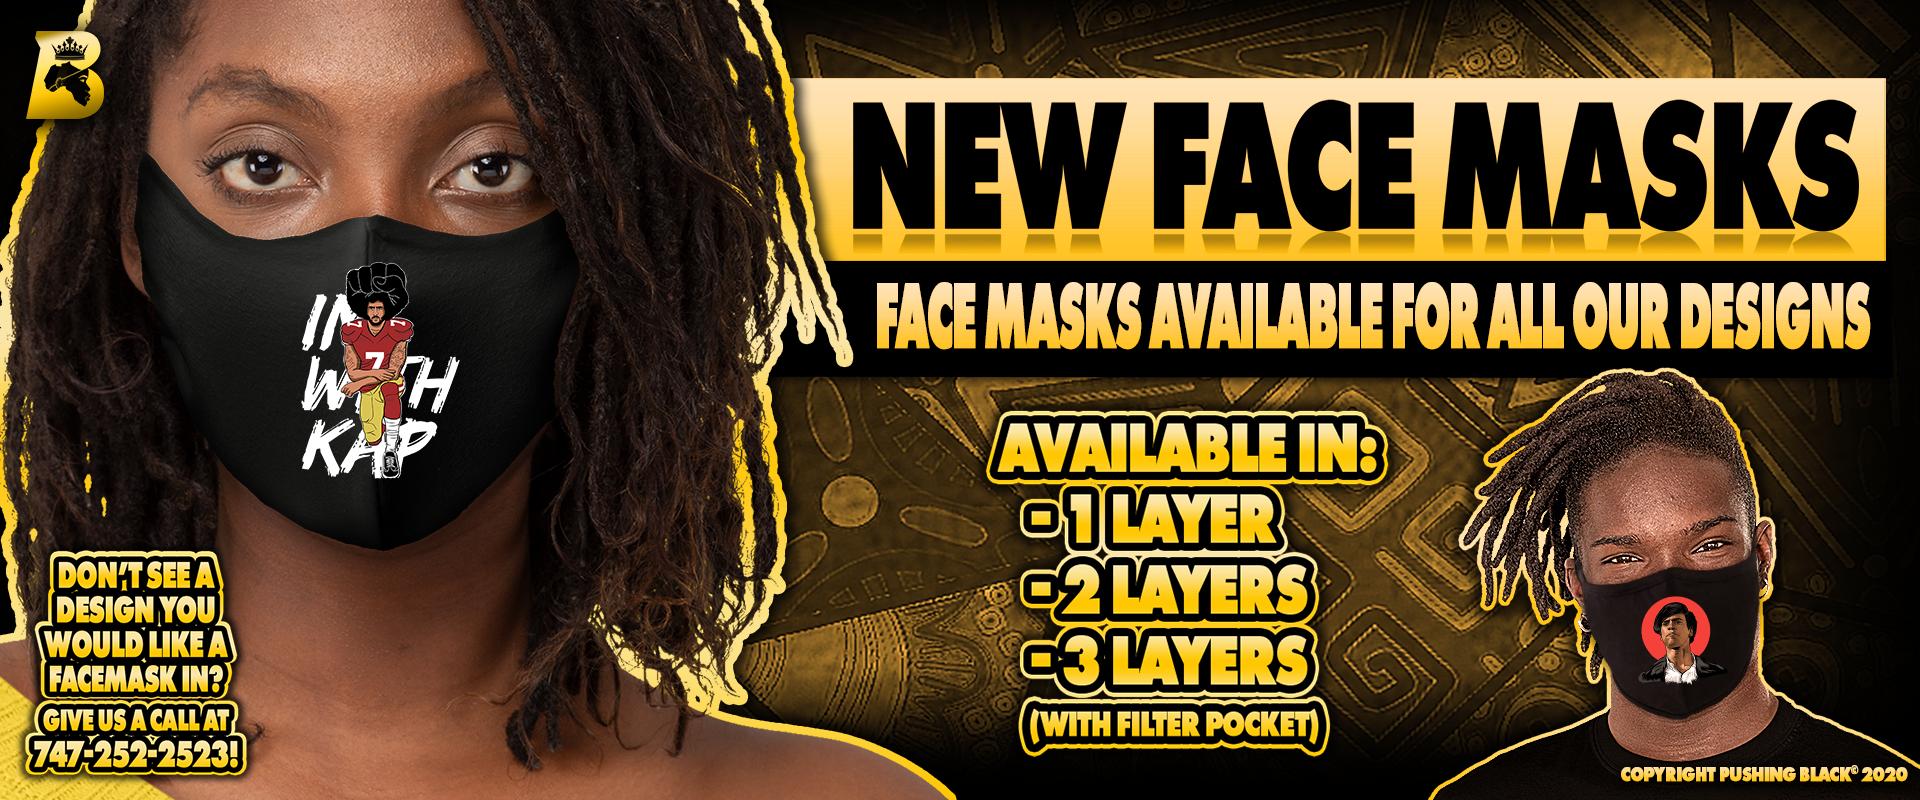 facemaskshomepage.png